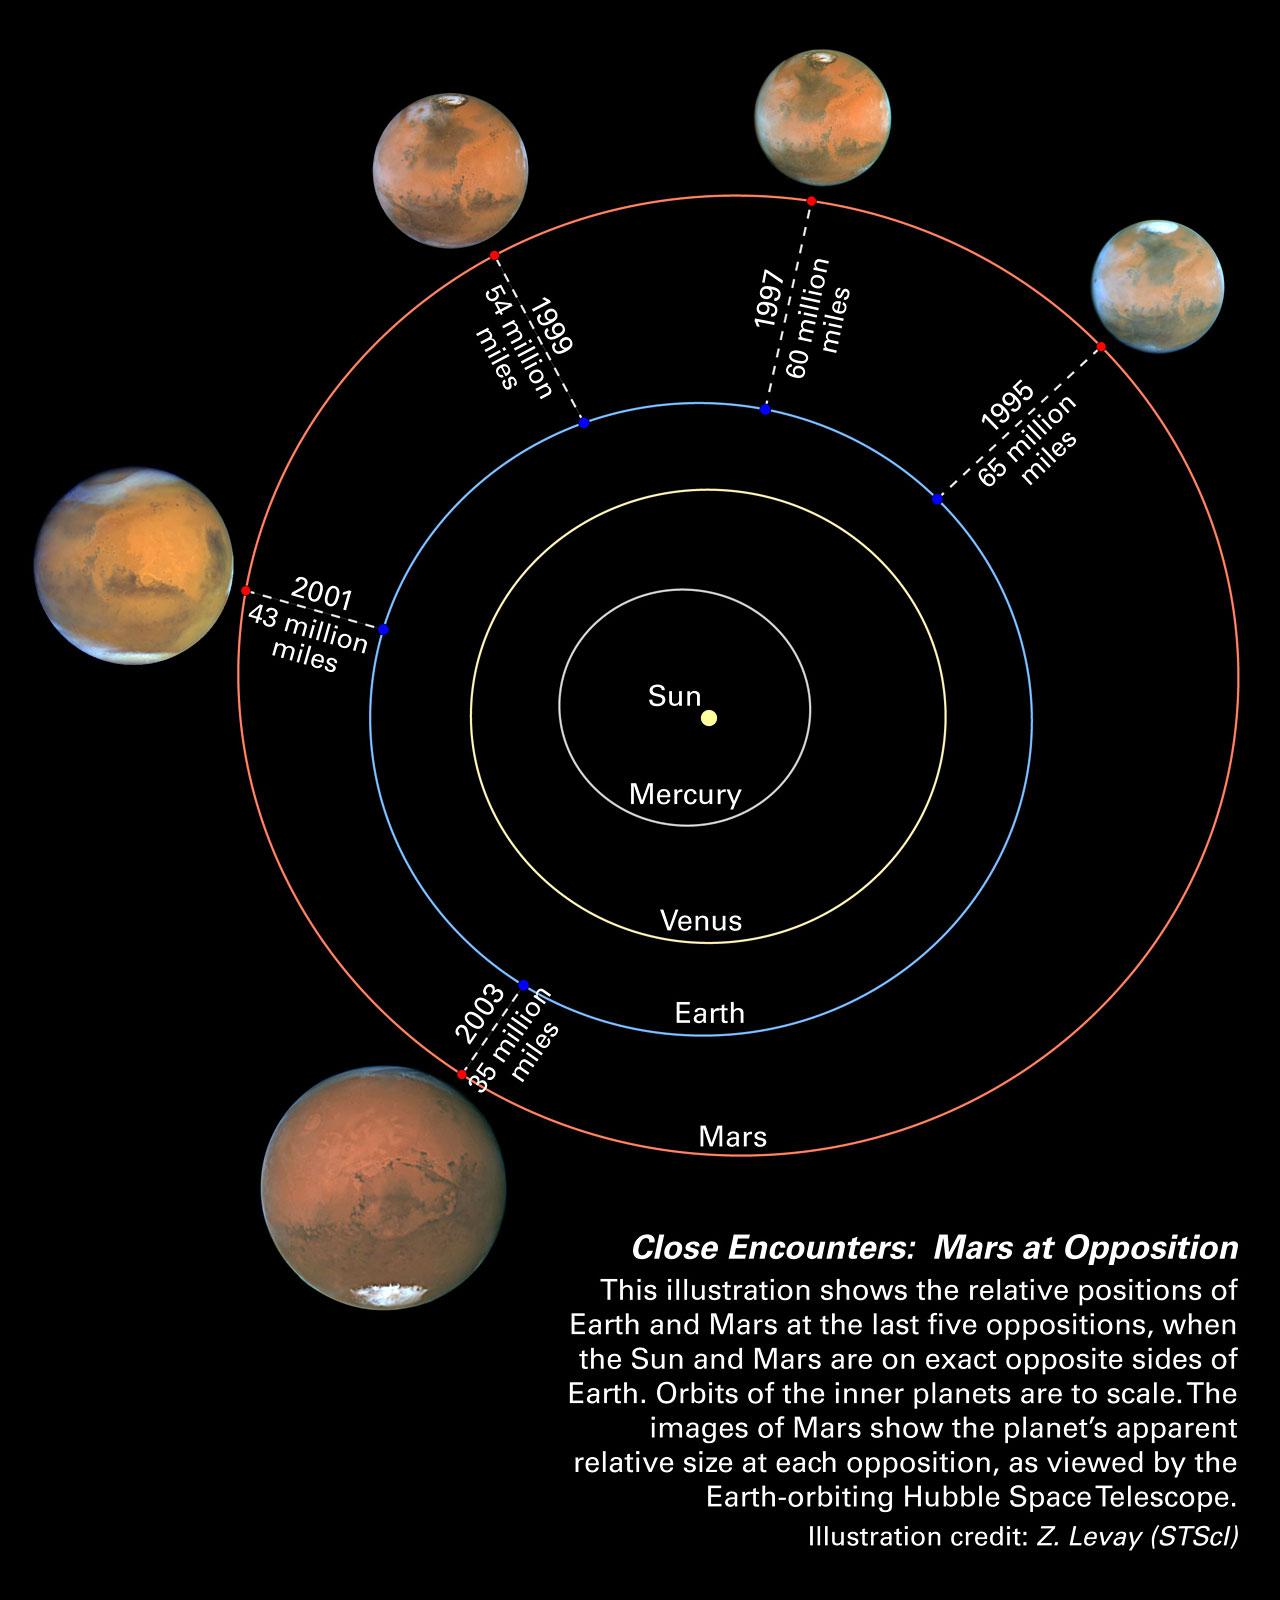 mars oppositions solar system diagram esa hubble. Black Bedroom Furniture Sets. Home Design Ideas